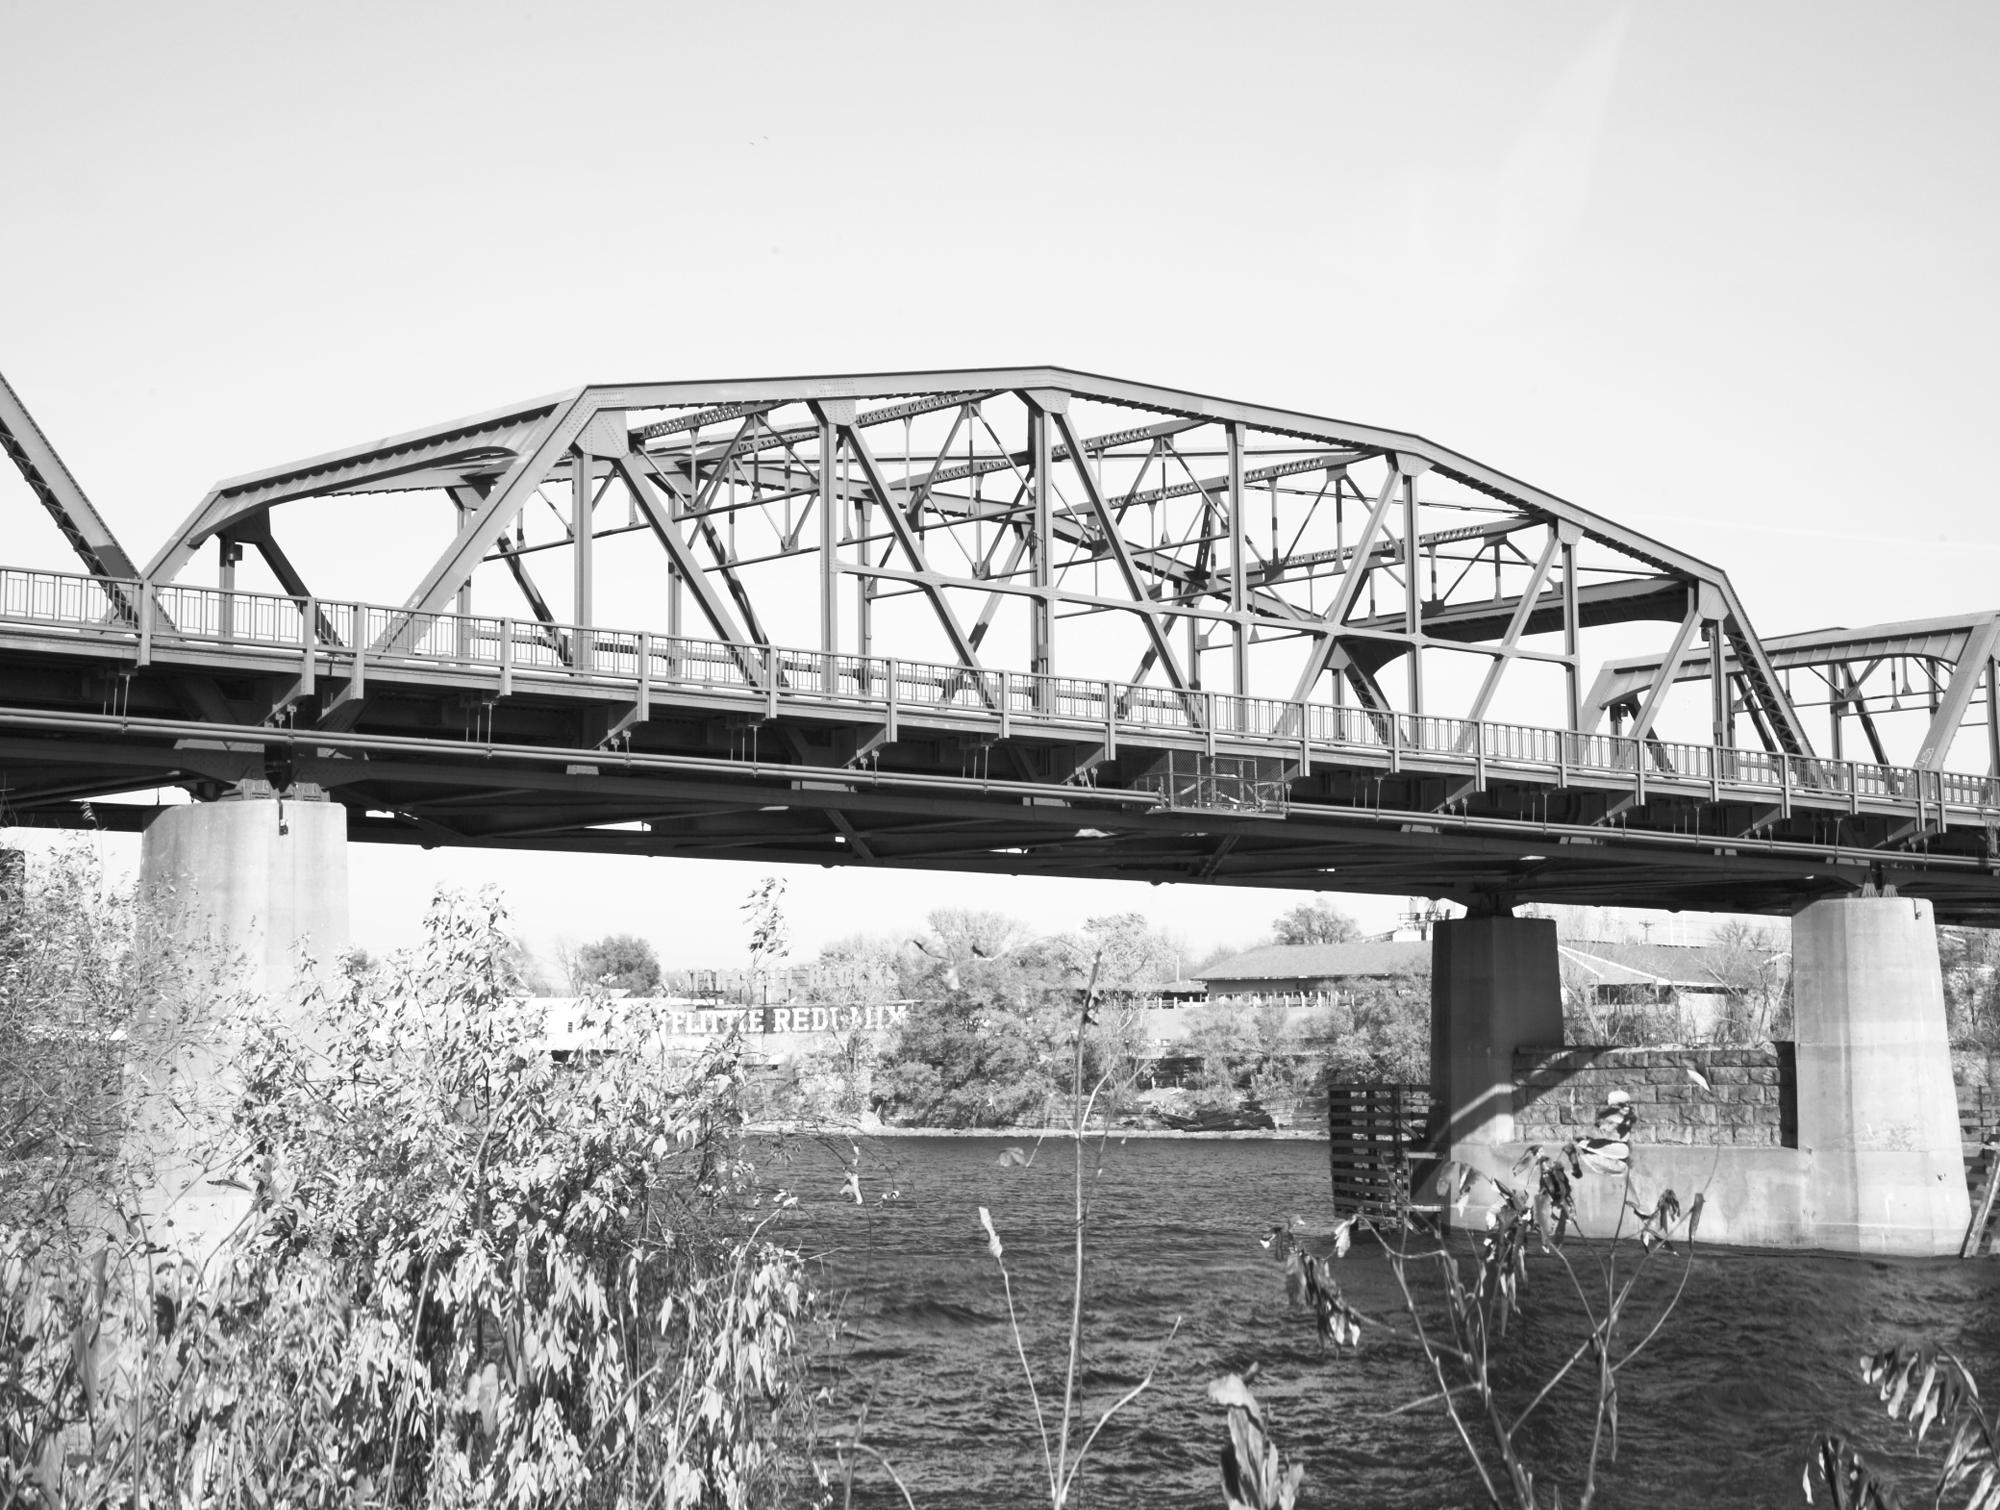 Lowry Avenue Bridge - HE-MPC-8351-04 (Please credit Daniel R. Pratt and the Minnesota Historic Property Record)